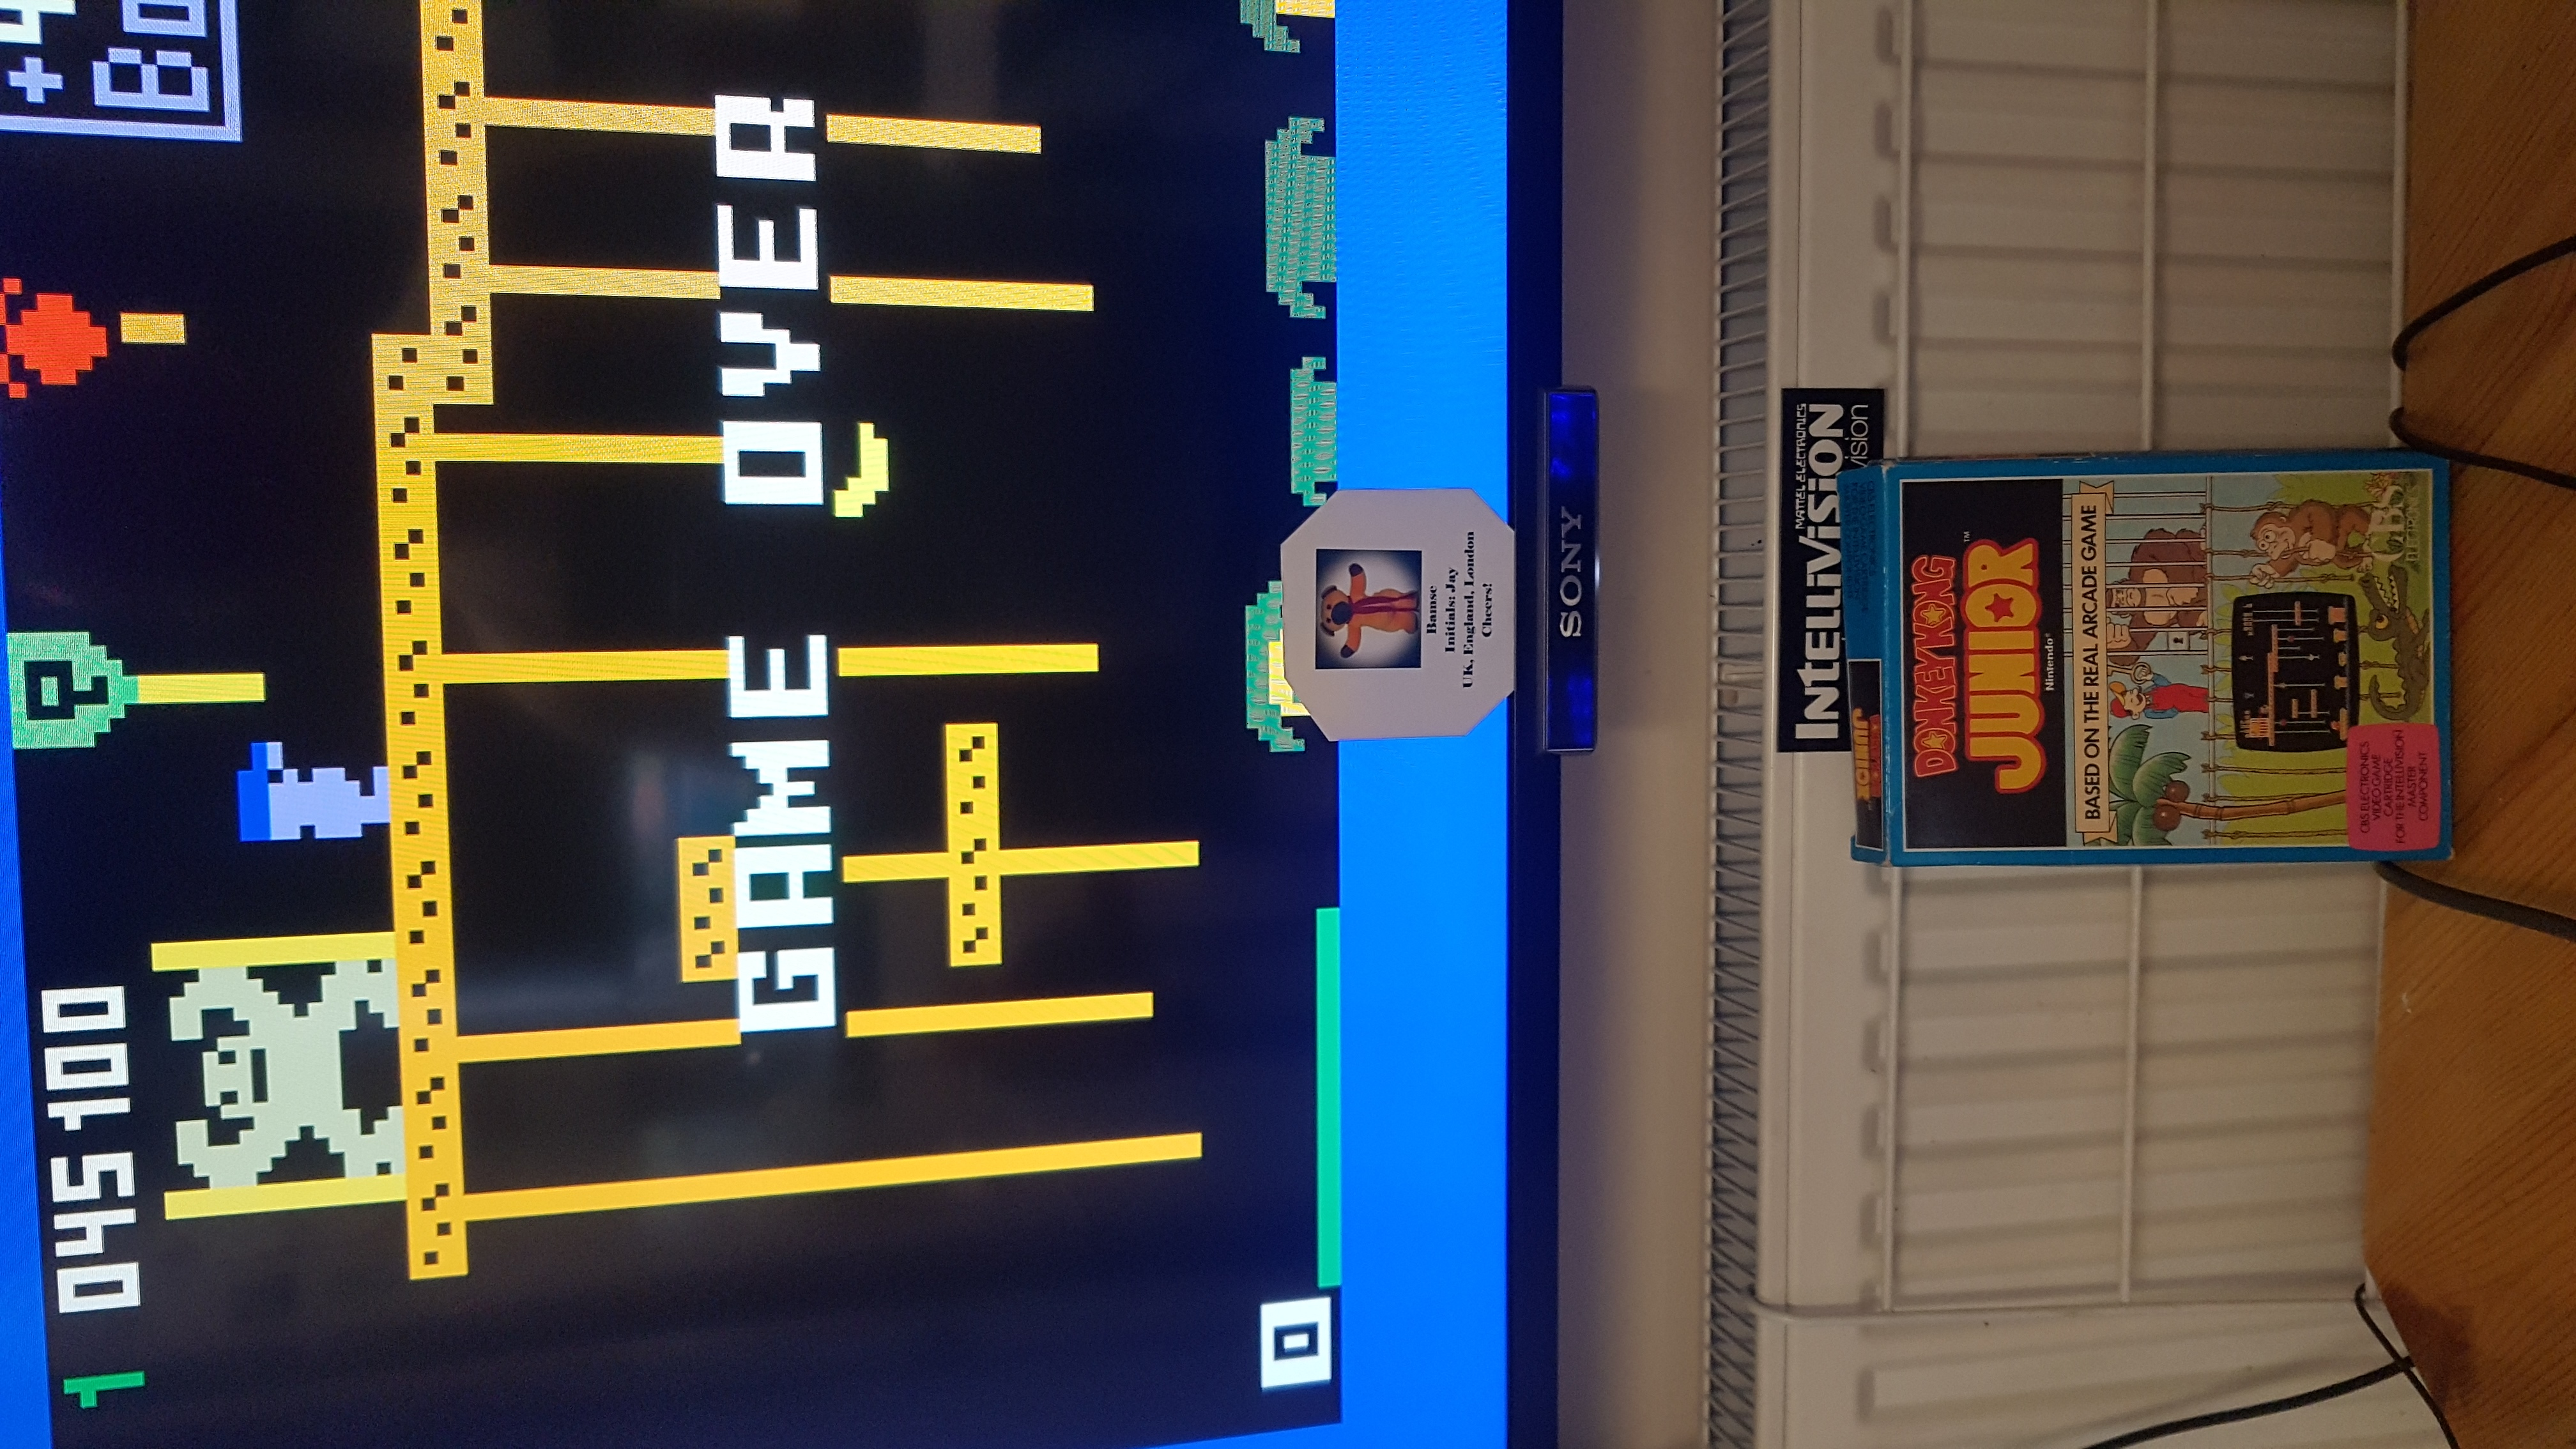 Bamse: Donkey Kong Jr. [Level 1] (Intellivision) 45,100 points on 2019-06-02 10:50:47